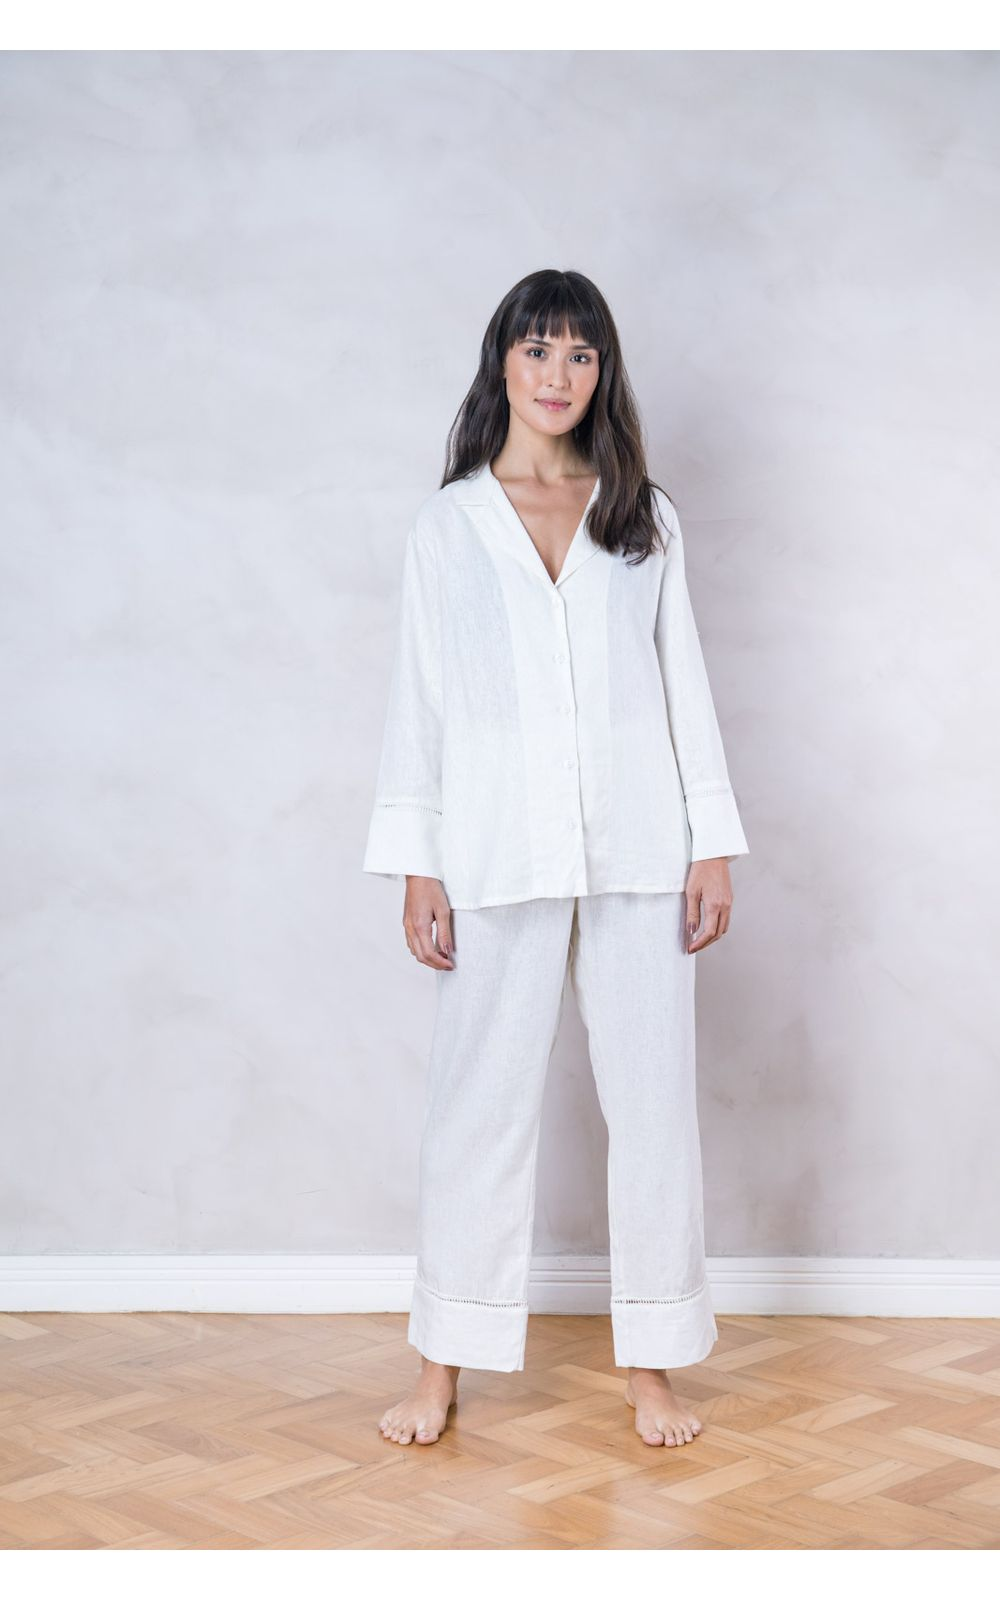 b5a494933 Pijama Longo Linho Branco